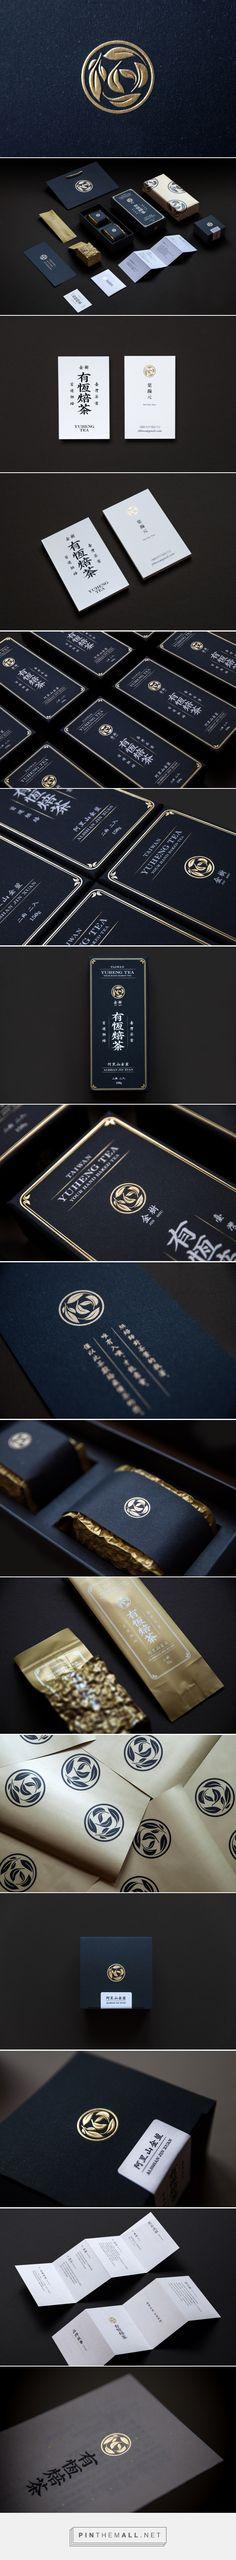 Yuheng Tea packaging design by OnionDesign (Taiwan) - http://www.packagingoftheworld.com/2016/07/yuheng-tea.html